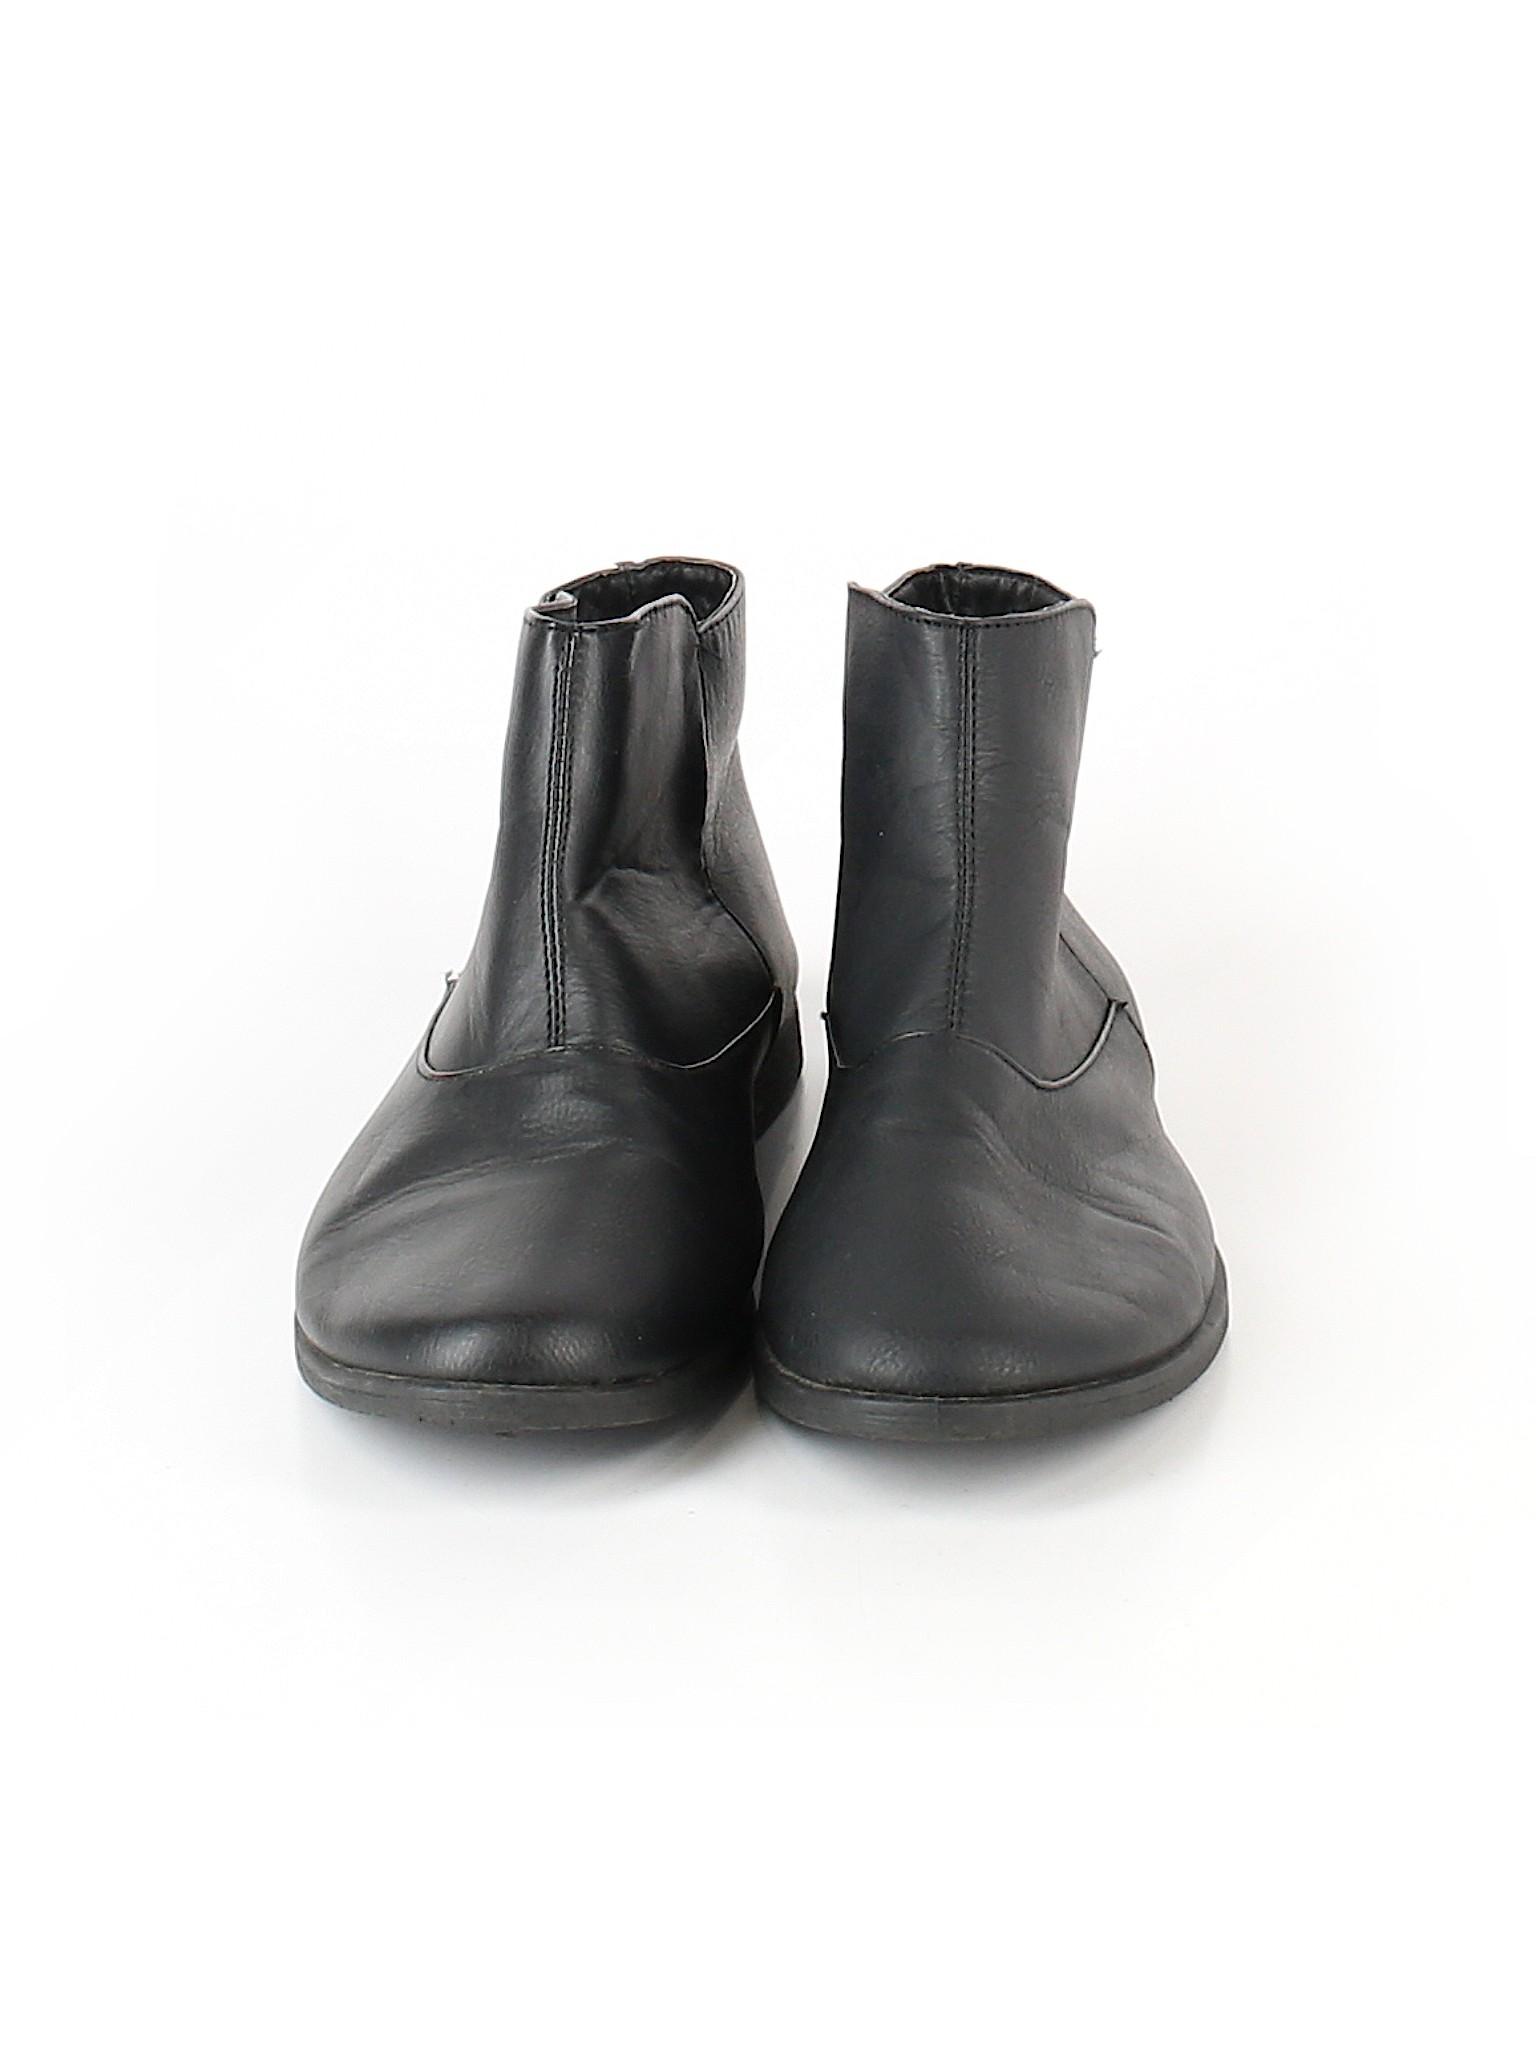 Ankle Ankle Boutique Solemates Boots promotion promotion Solemates Boutique ySRRpc7